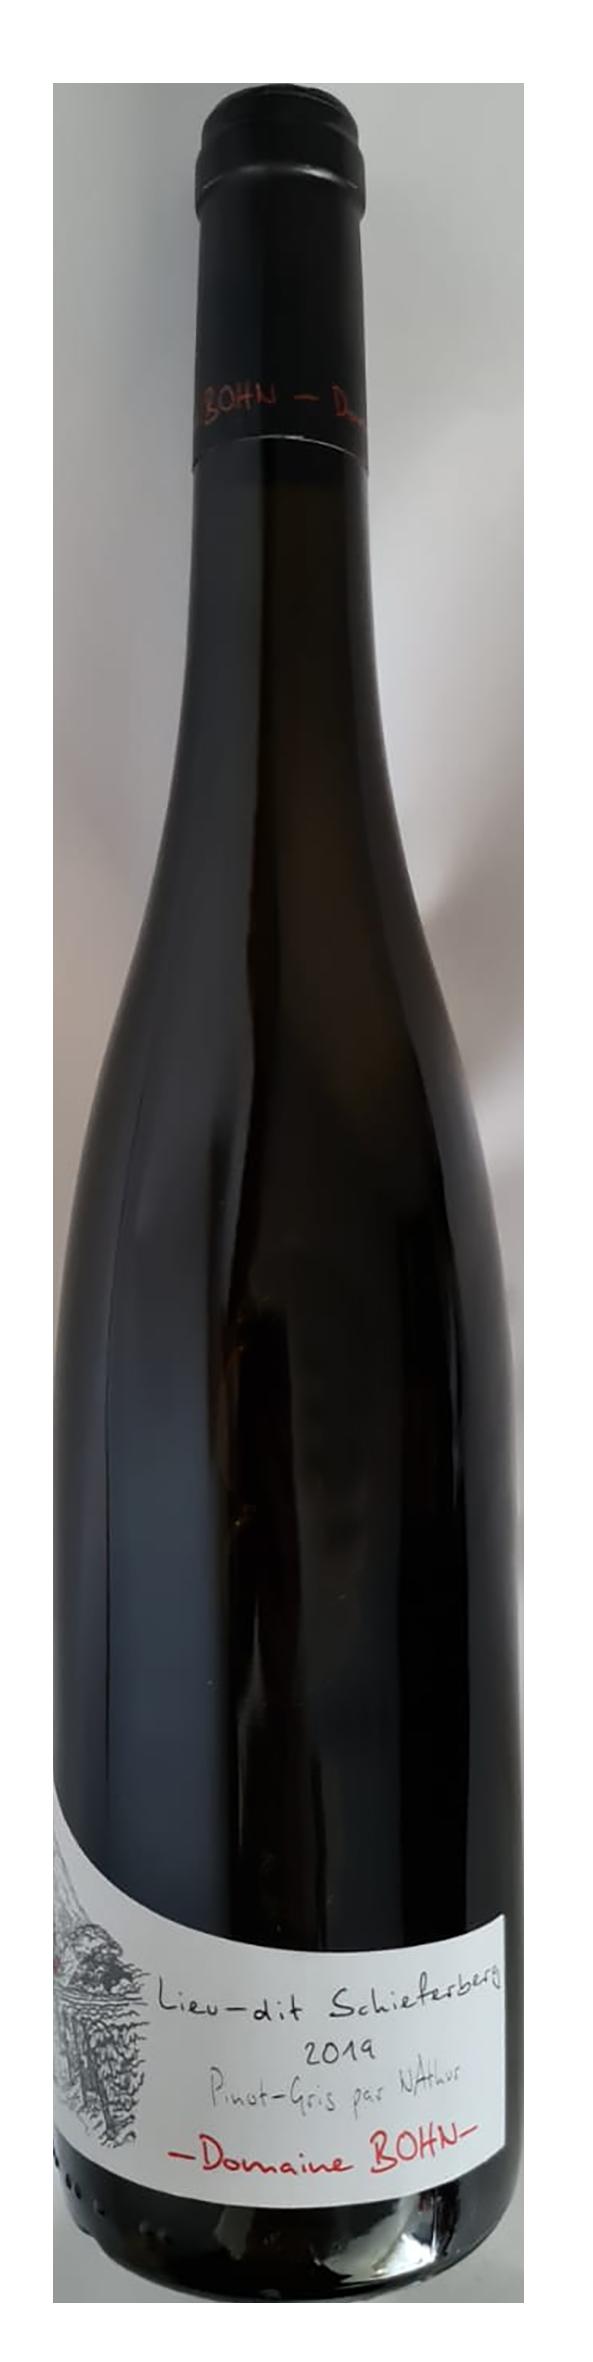 Pinot Gris Schieferberg